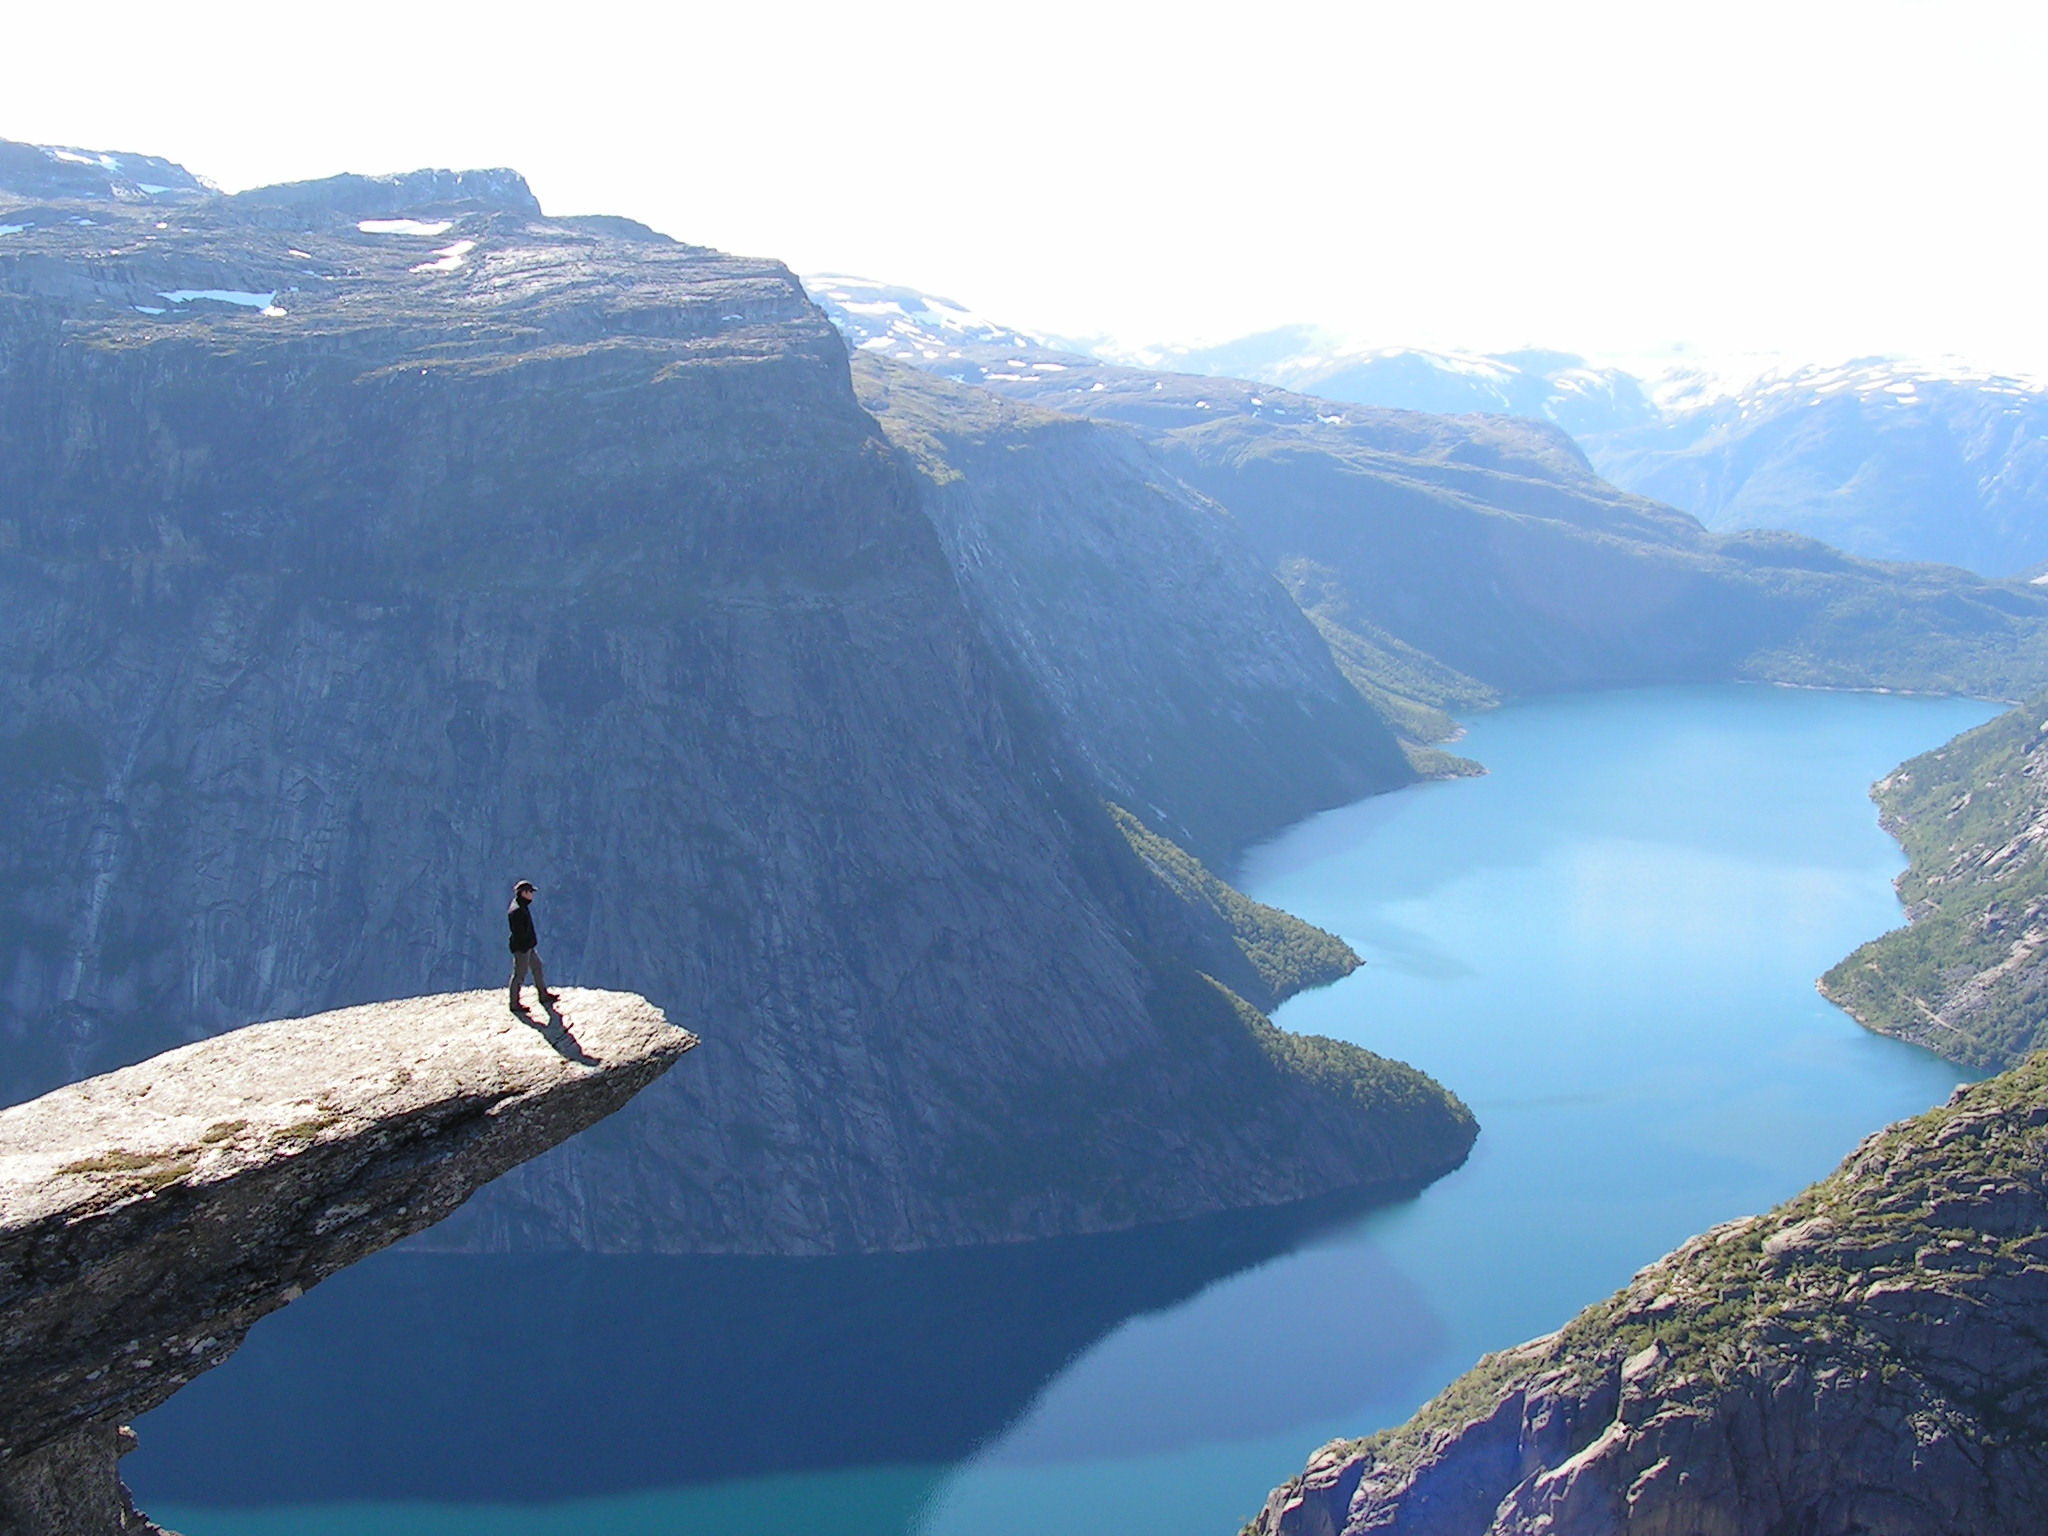 Landscapes Norway Wallpaper 2048x1536 Landscapes Norway Fjord 2048x1536